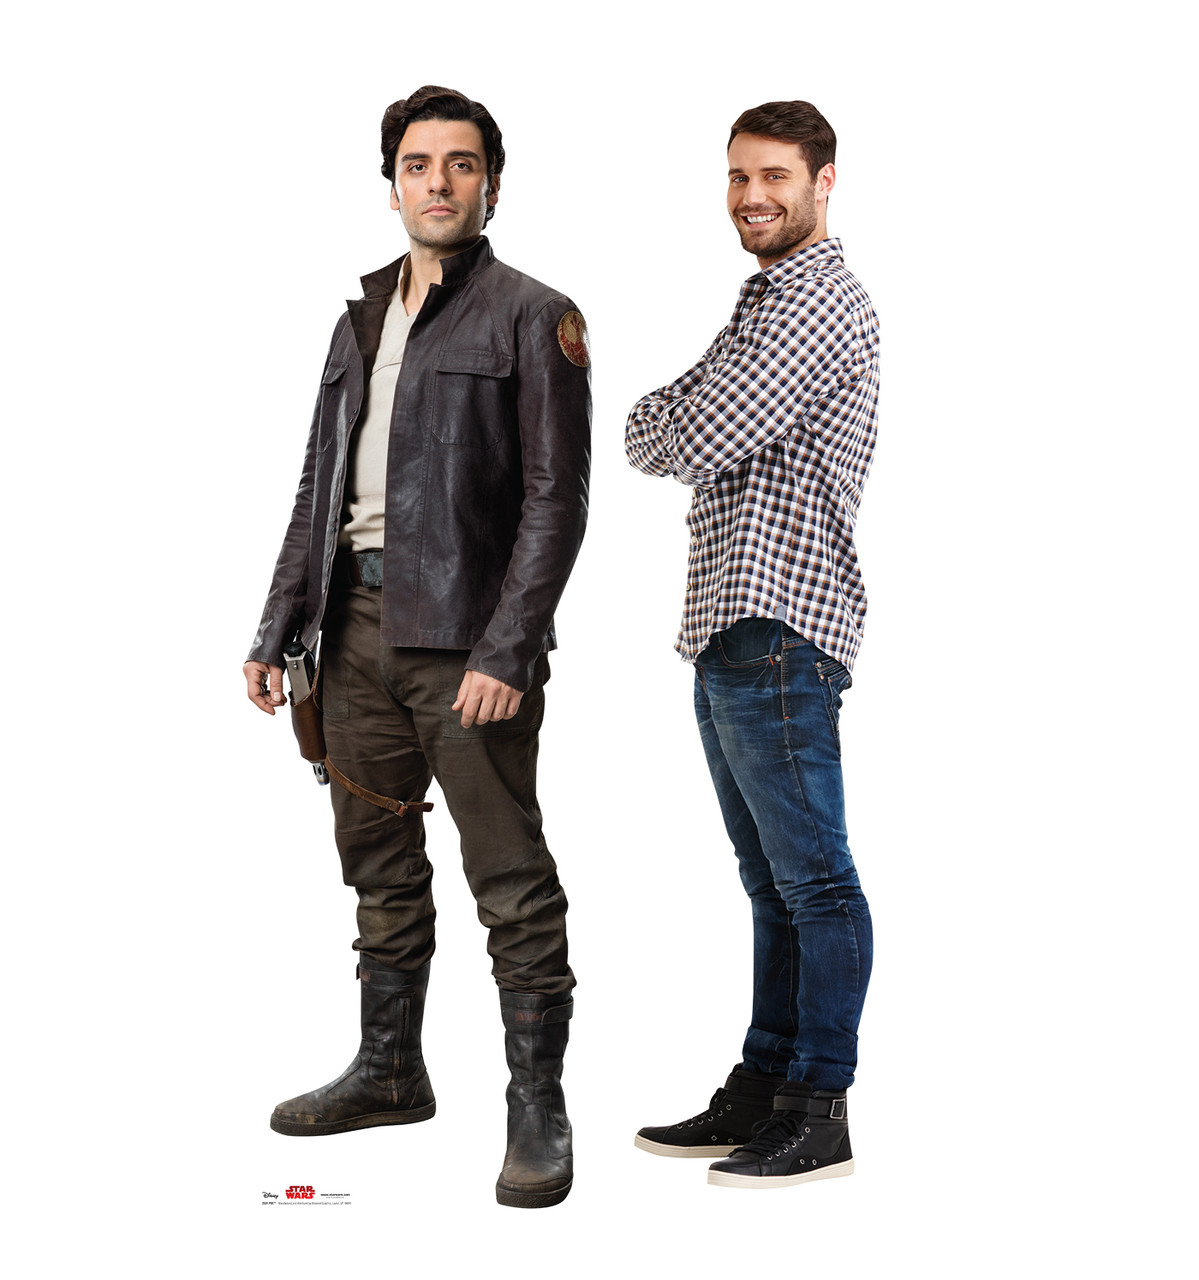 Poe - Star Wars: The Last Jedi Life-Size Cardboard Cutout 3